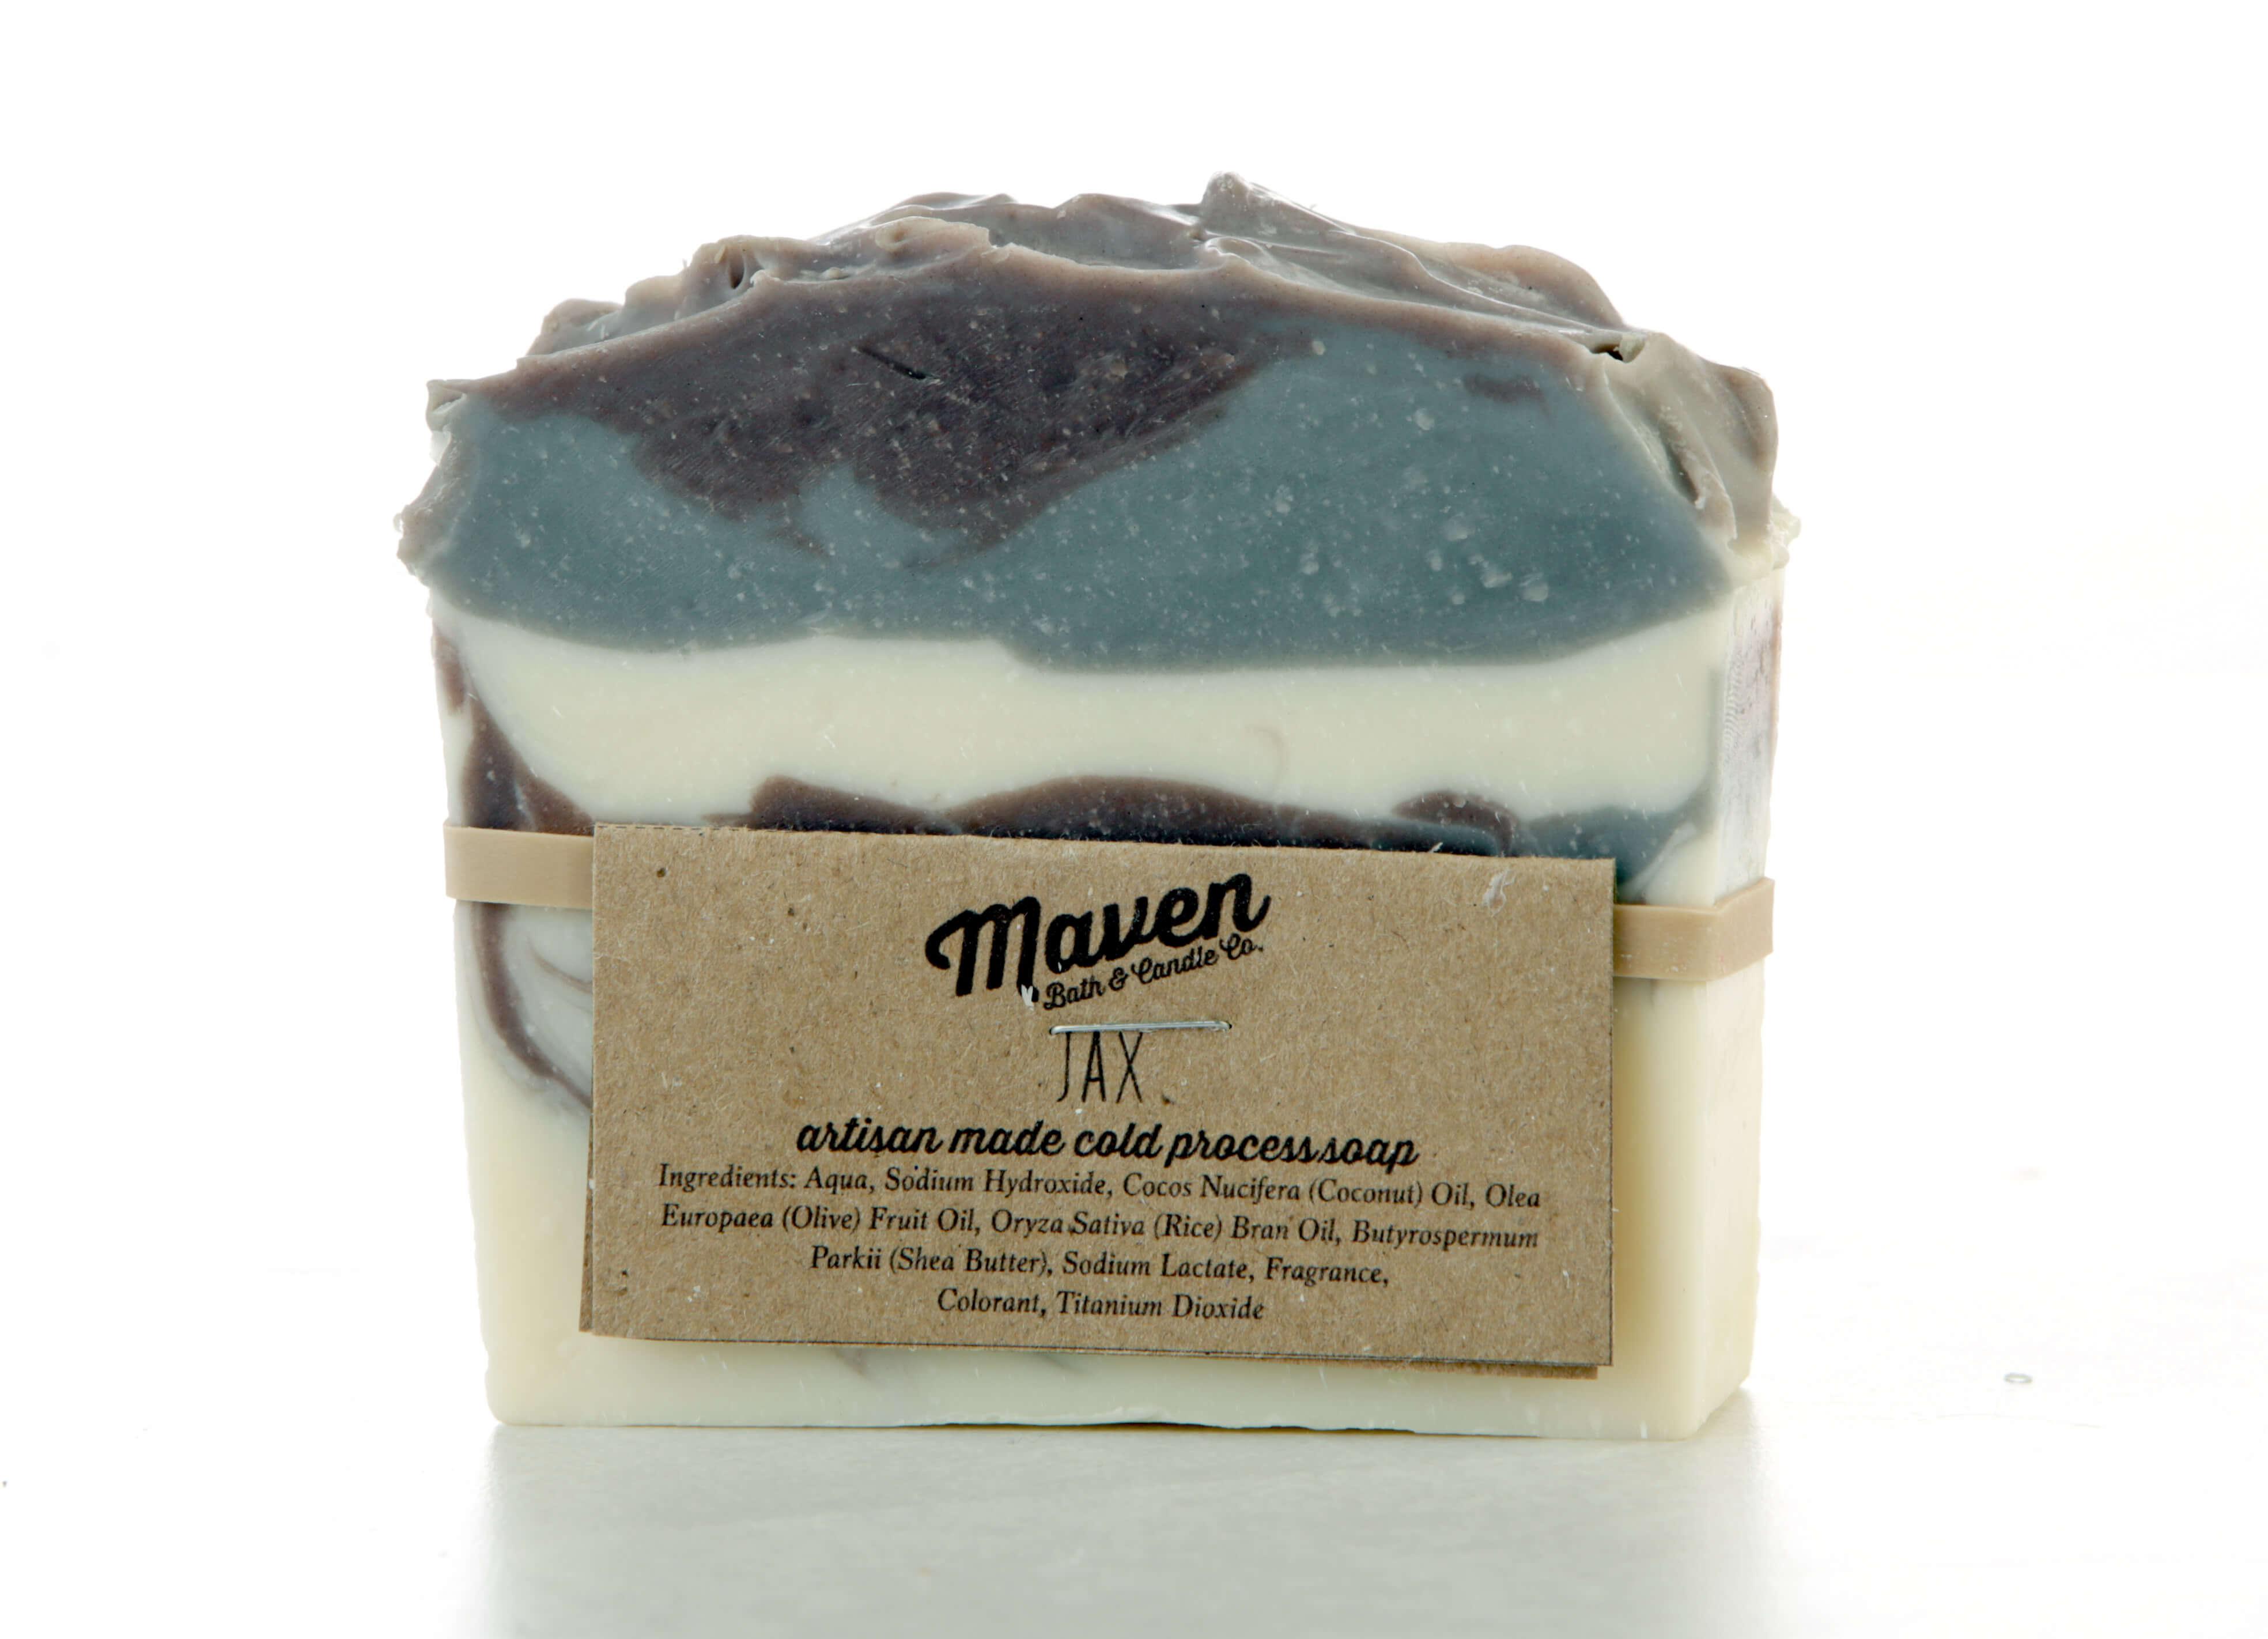 Maven Jax artisan-made cold process soap